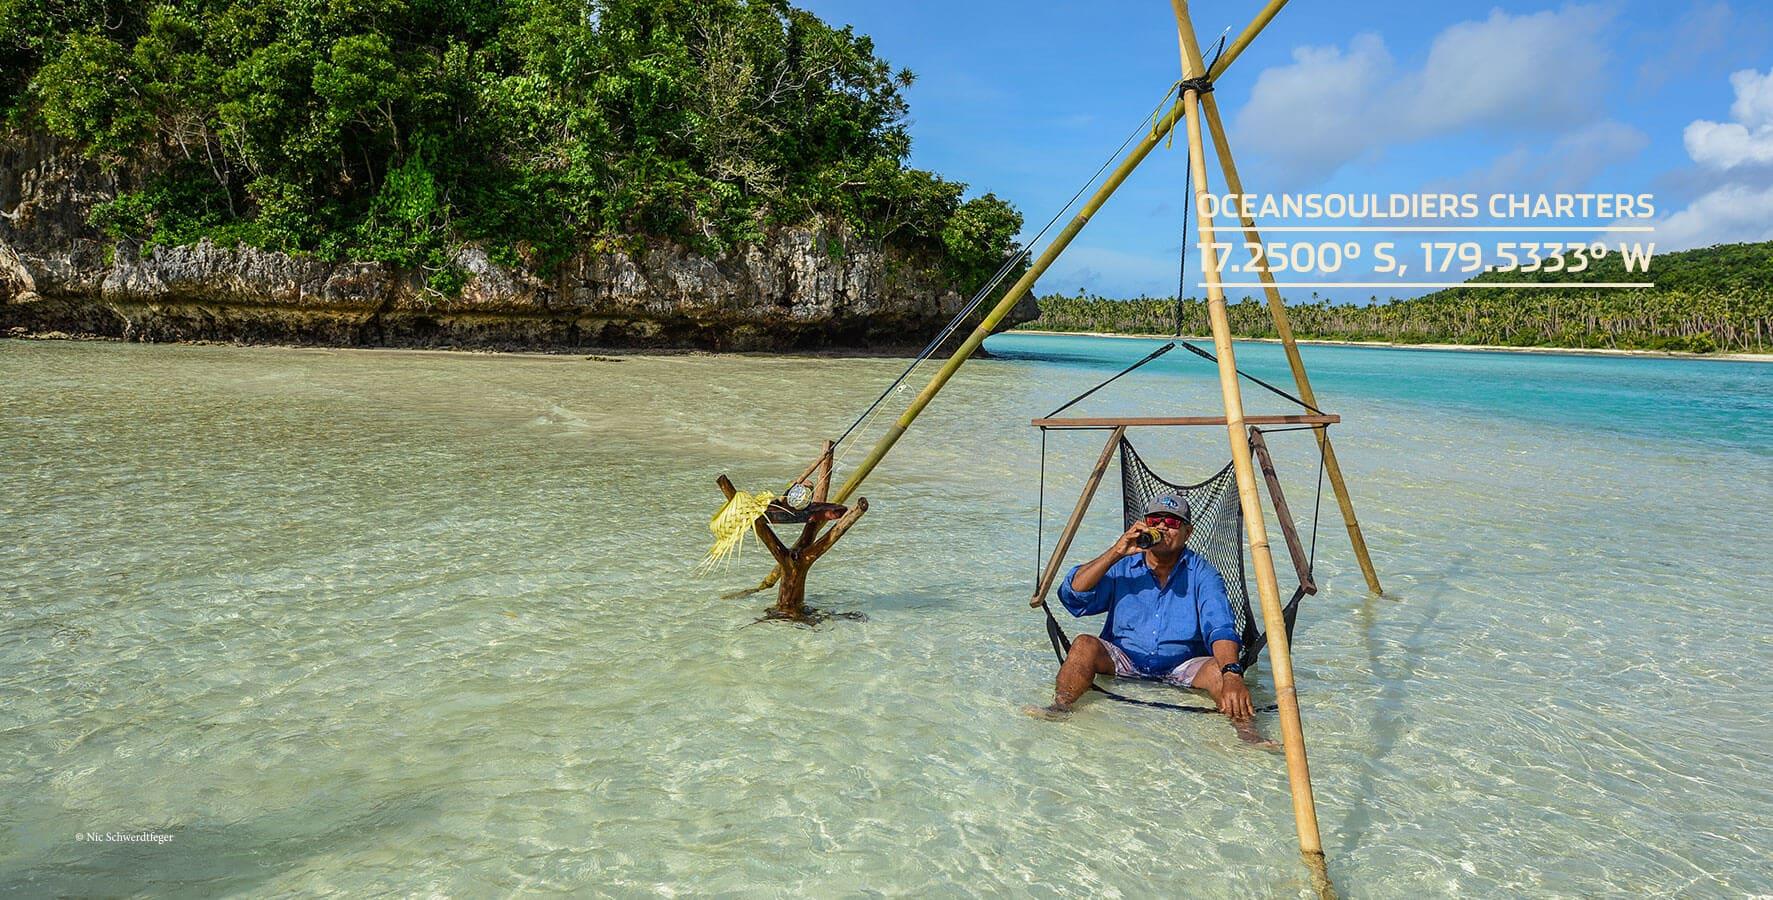 OceanSouldiers Amanzi-Wai Camp